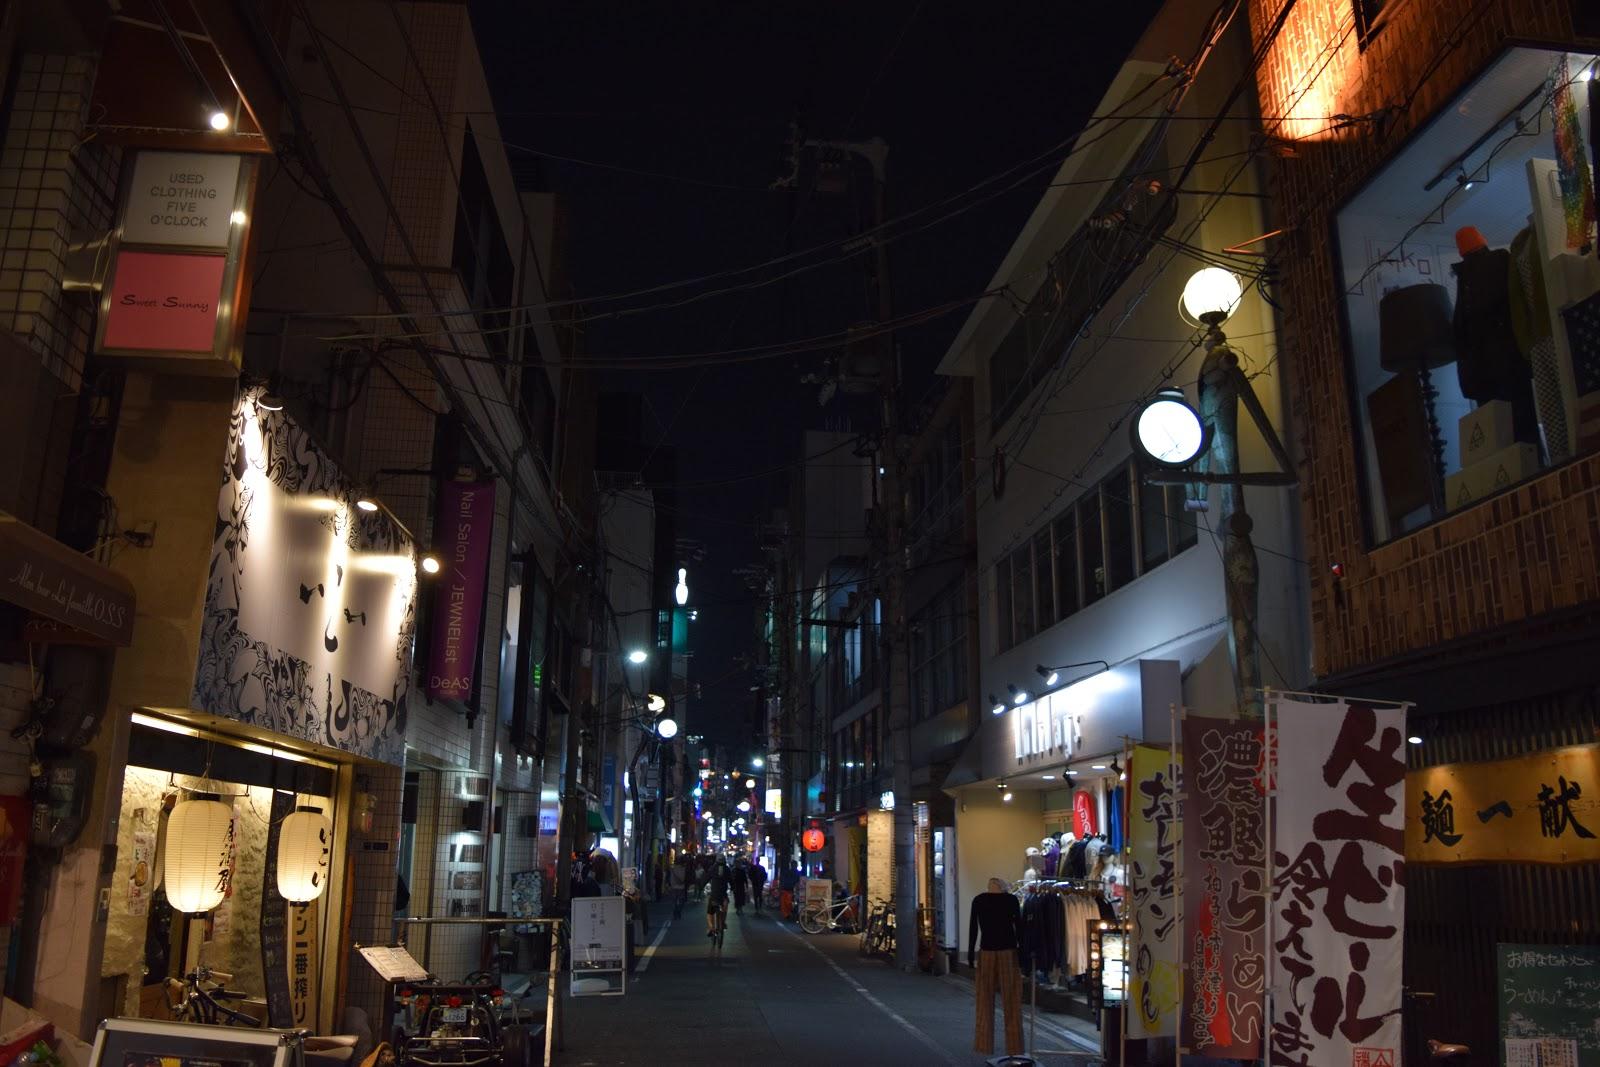 Amemura, Osaka at night